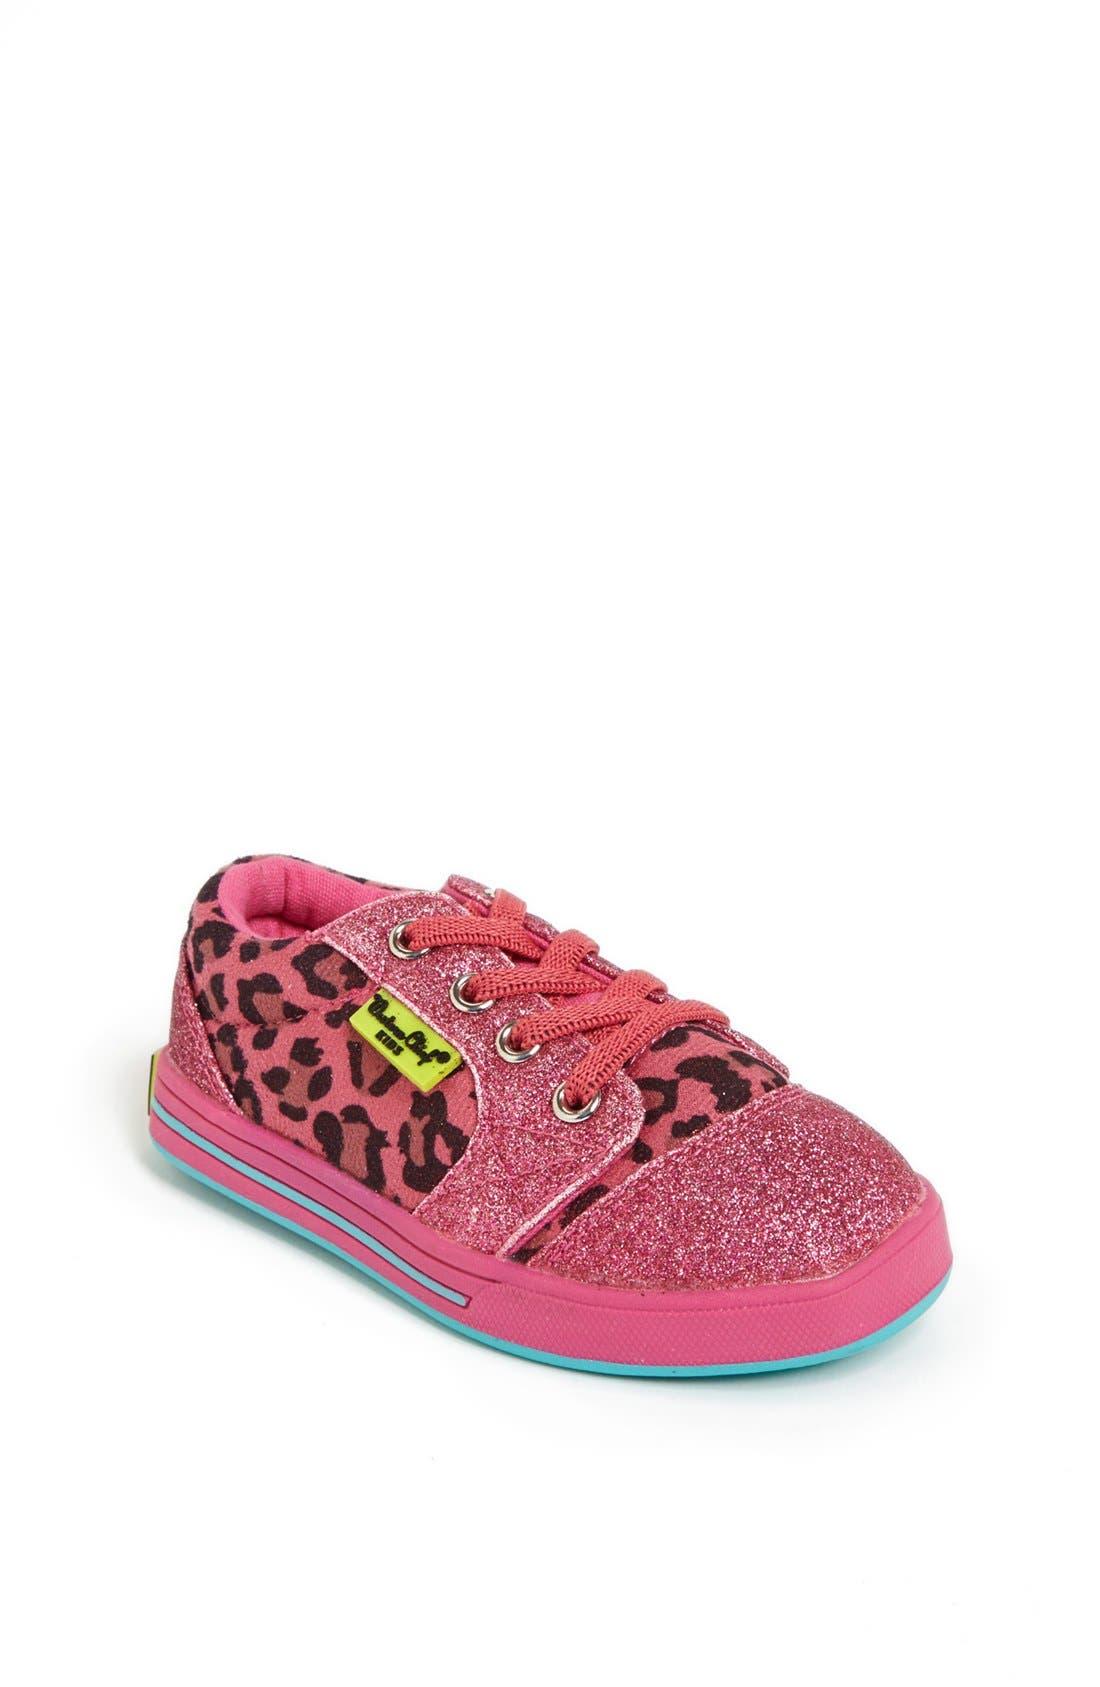 Main Image - Western Chief 'Flashy Leopard' Sneaker (Walker & Toddler)